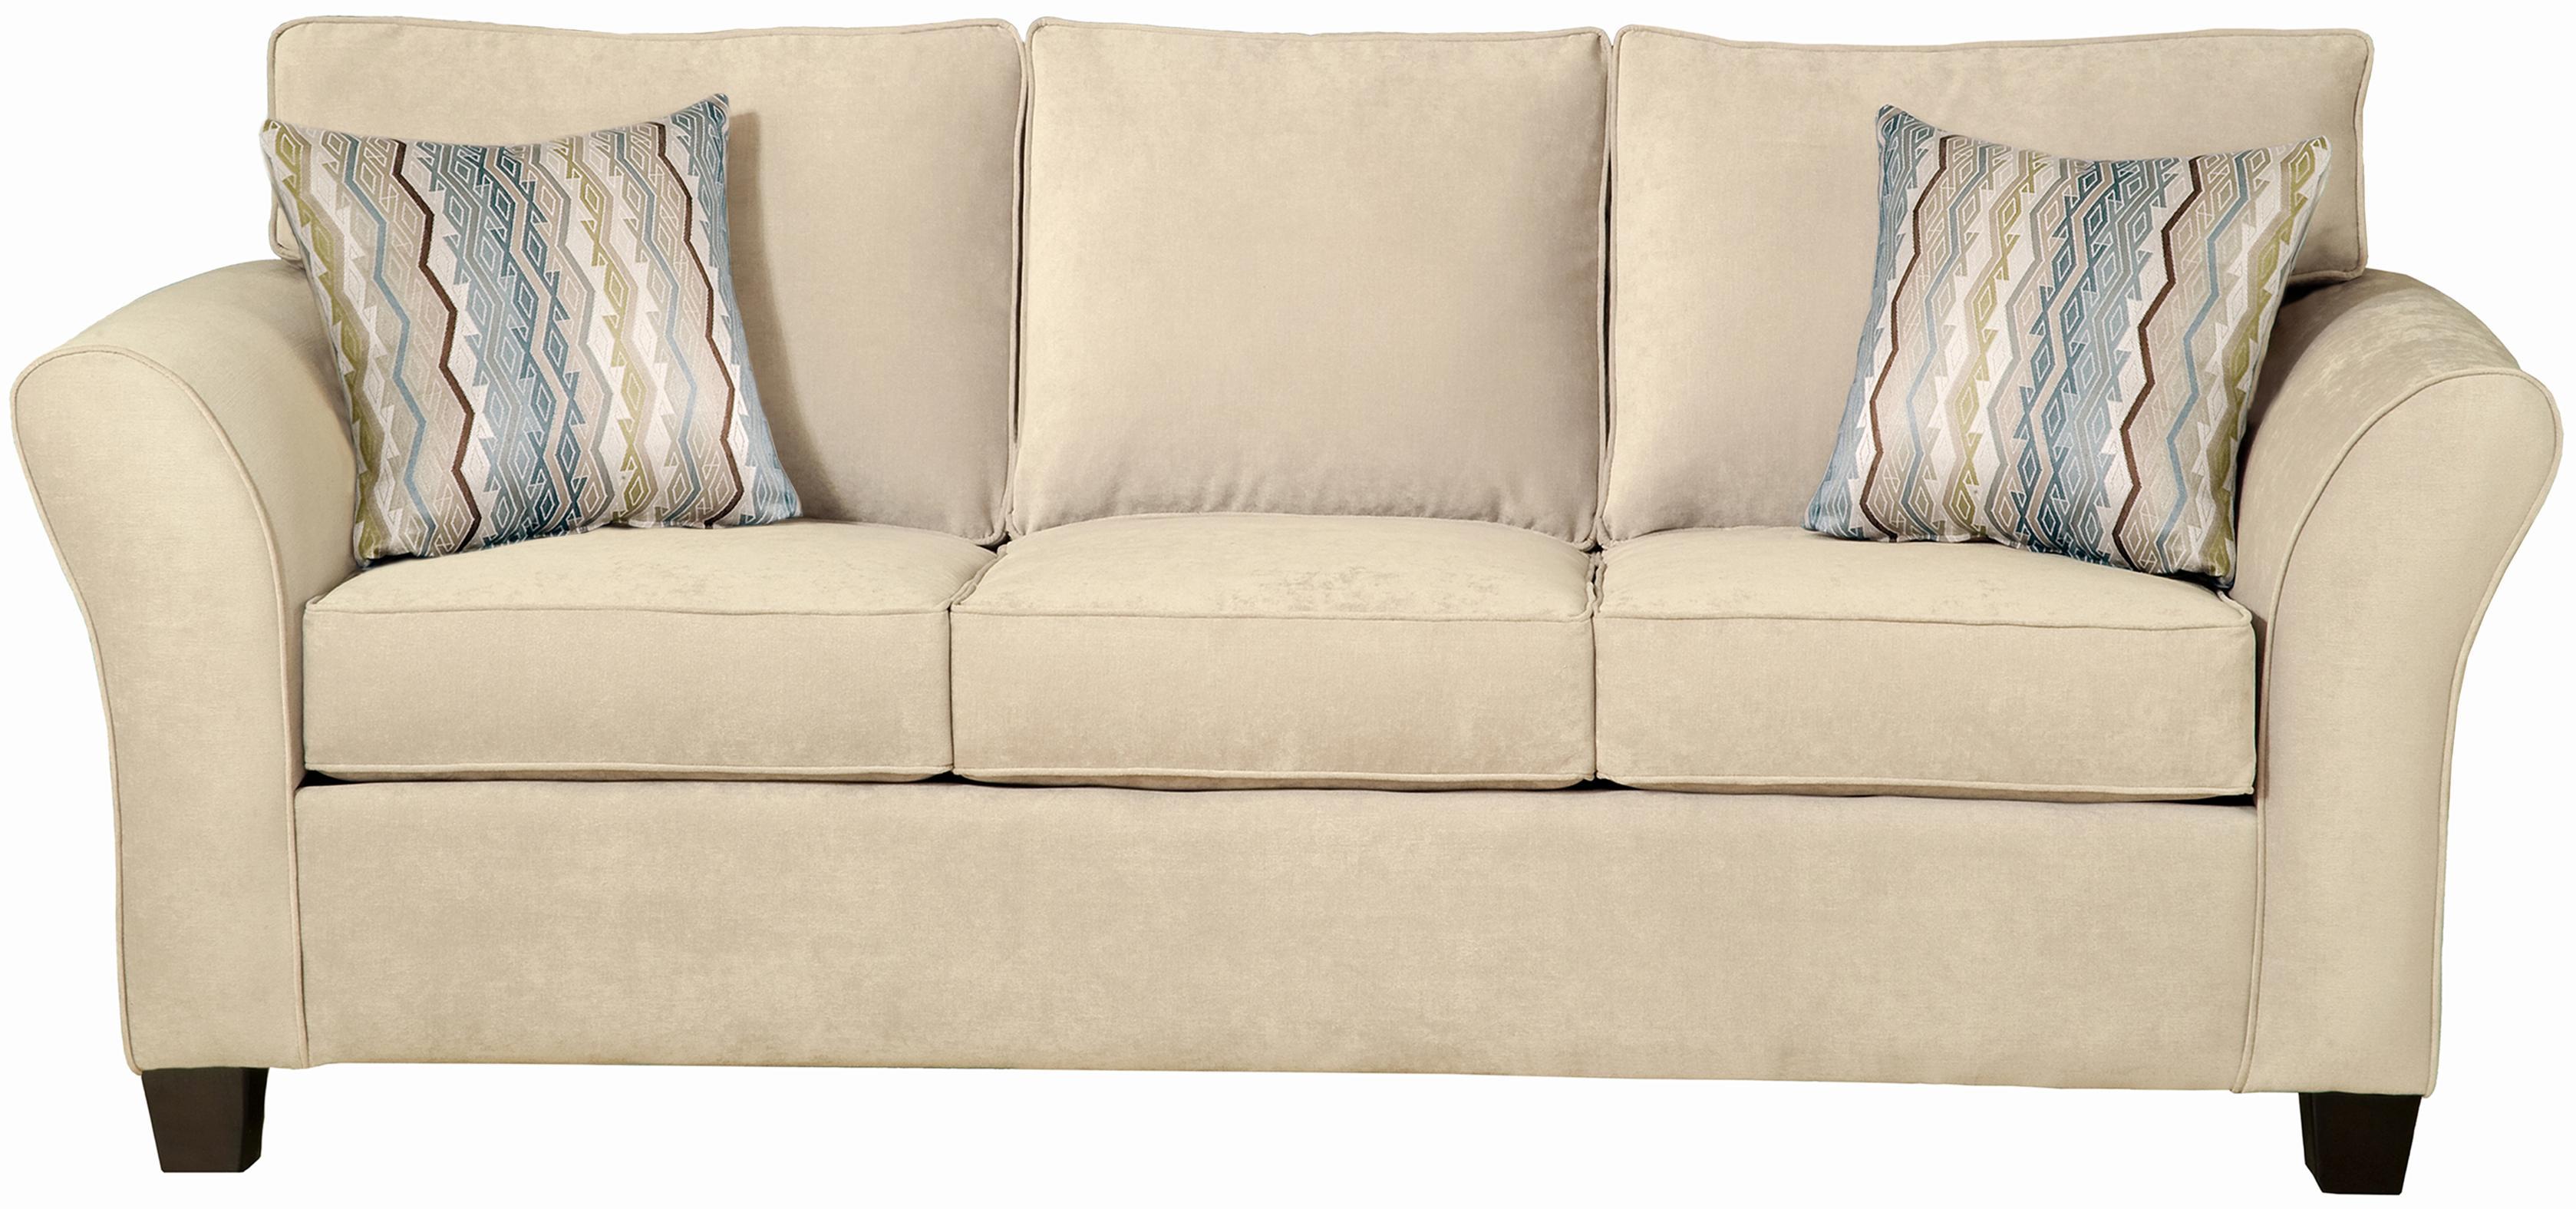 Belfort Essentials Addison Stationary Sofa - Item Number: 8400-30